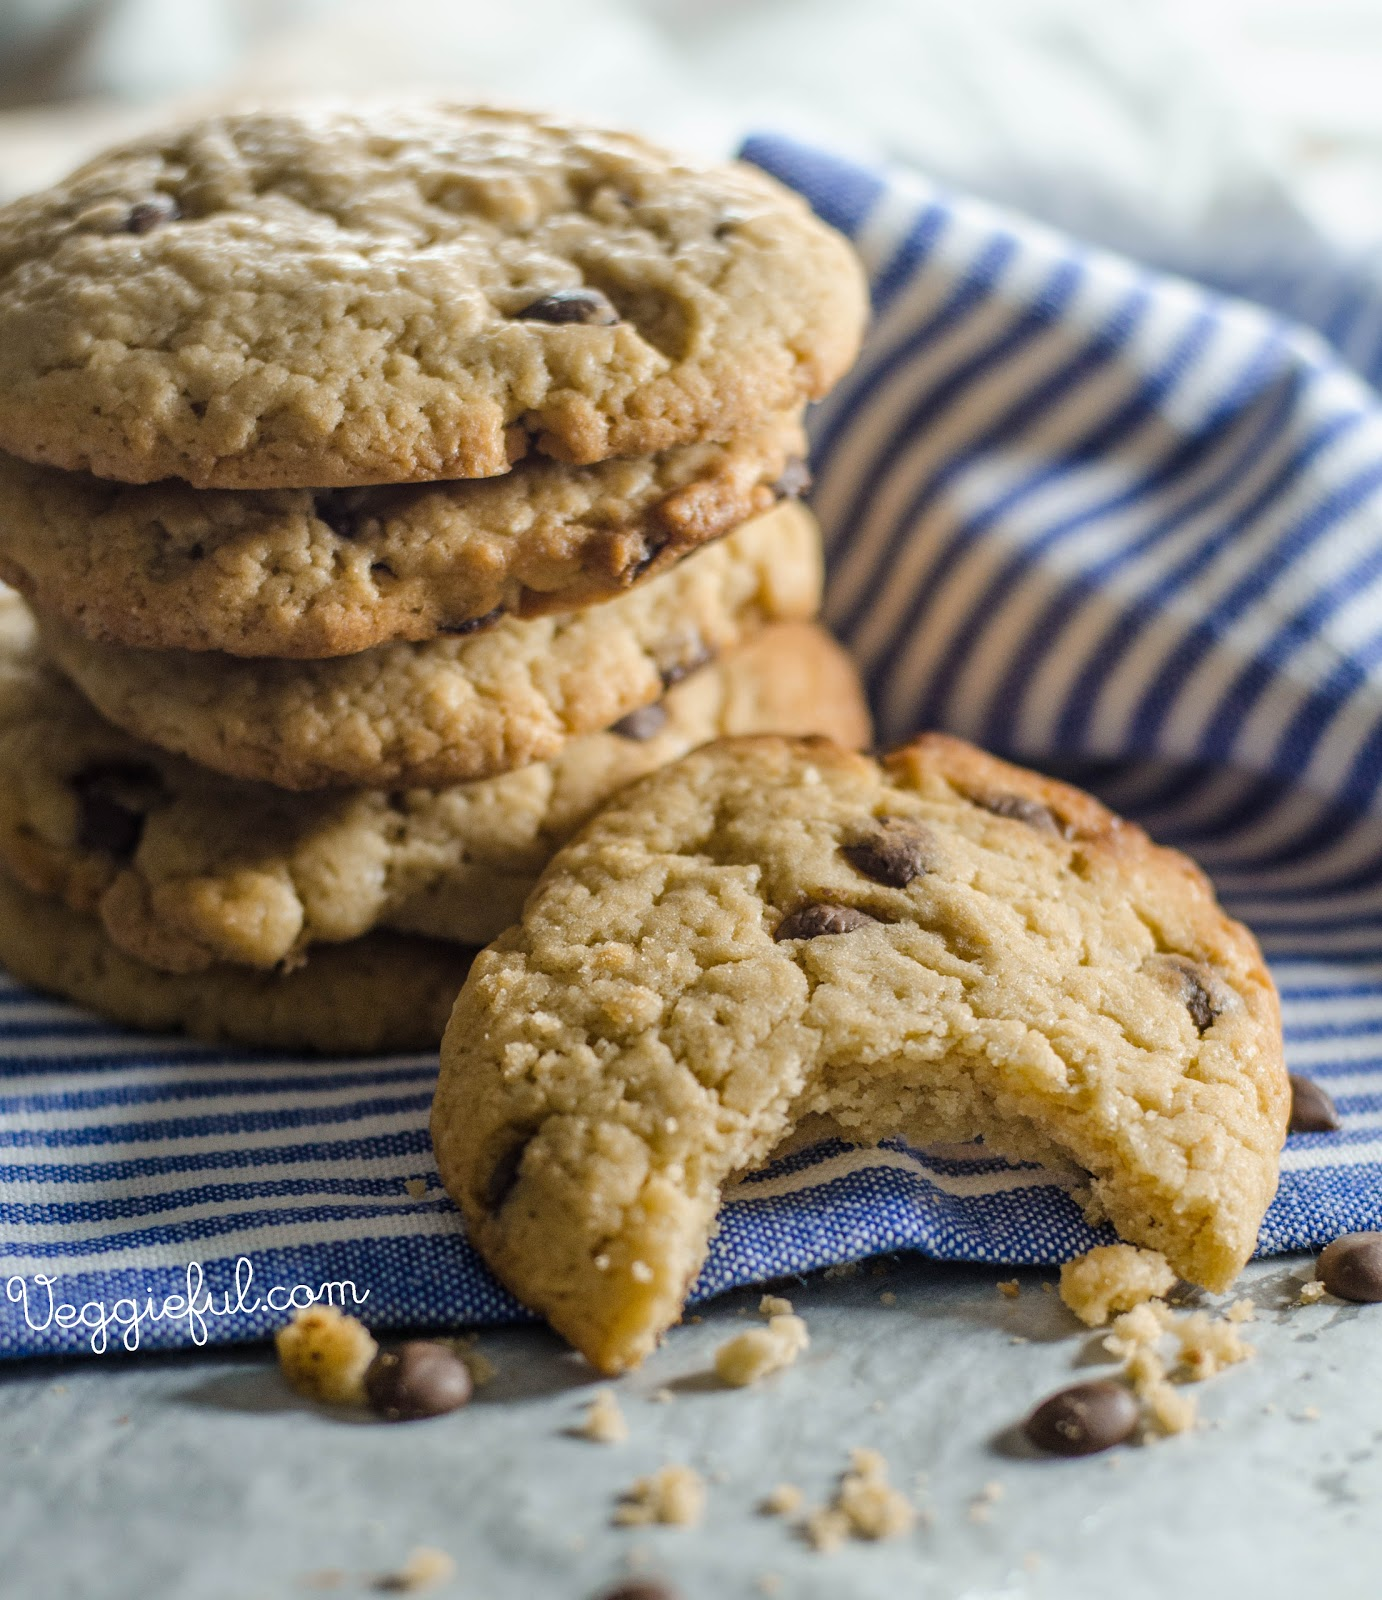 Veggieful: Vegan Chocolate Chip Cookie Recipe